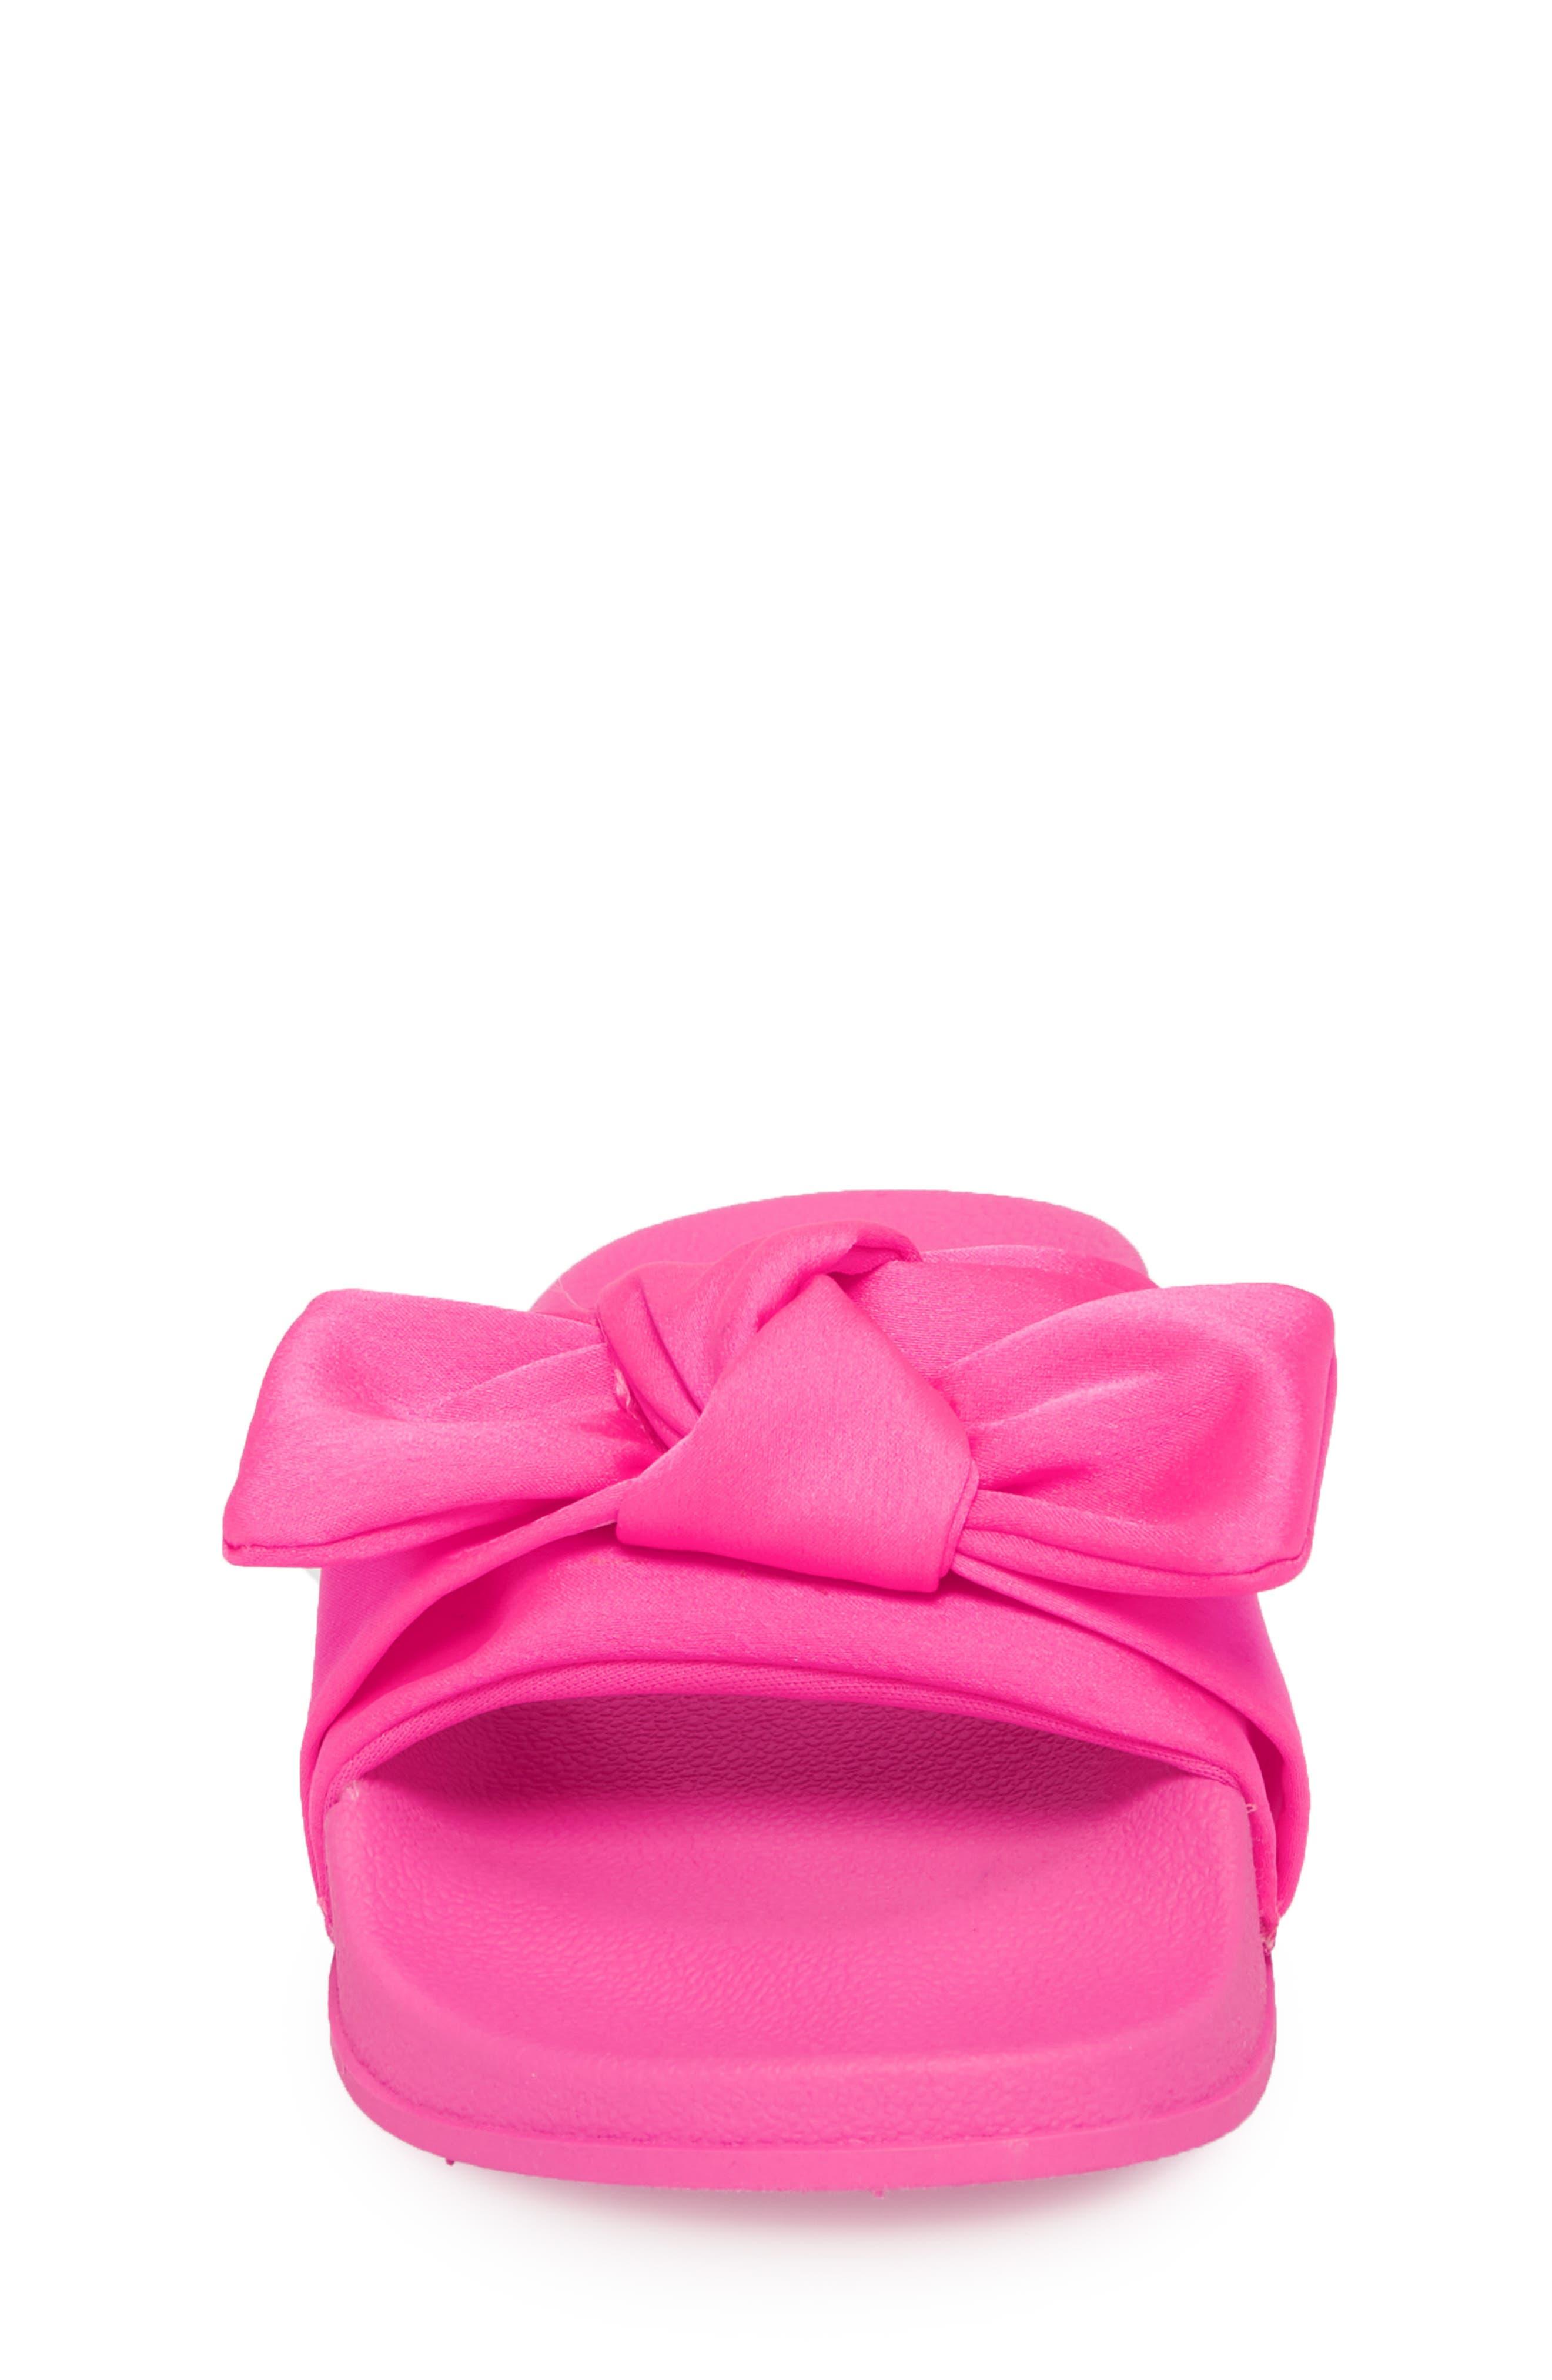 JSilky Slide Sandal,                             Alternate thumbnail 4, color,                             Hot Pink